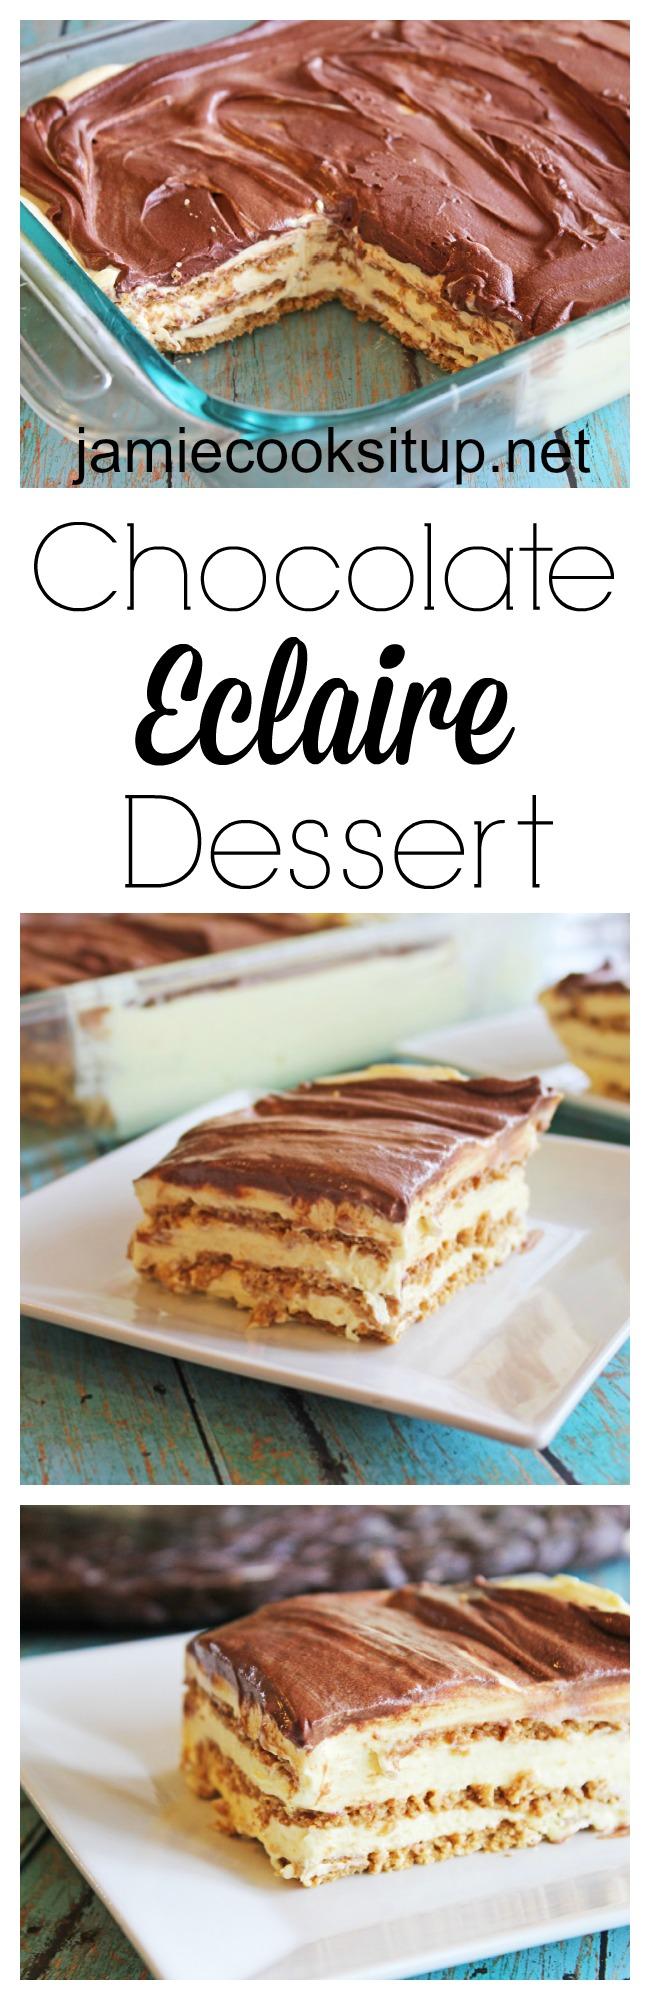 Chocolate Eclair Dessert at Jamie Cooks It Up